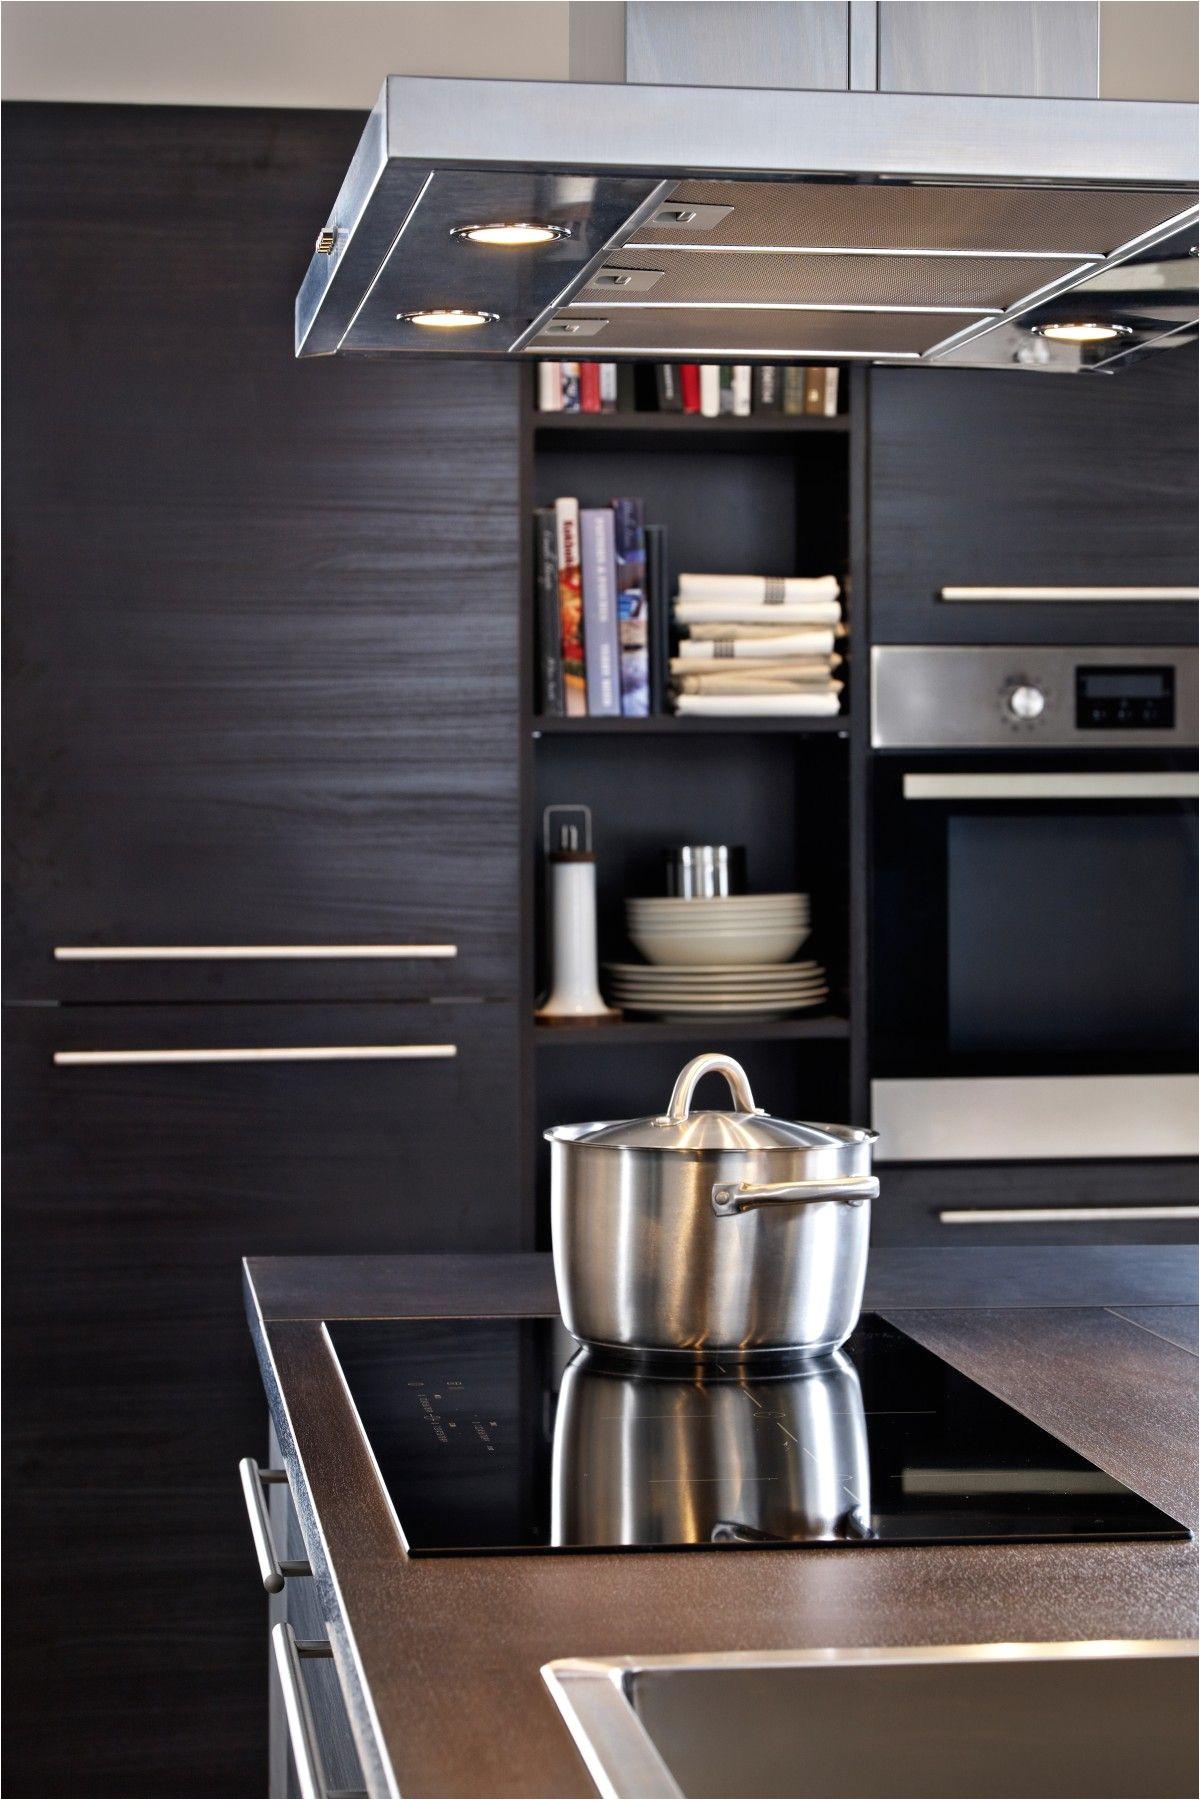 Radiator Covers Ikea Dublin Black Wood Grain Ikea Tingsryd Cabinets W Open Shelves for Cook